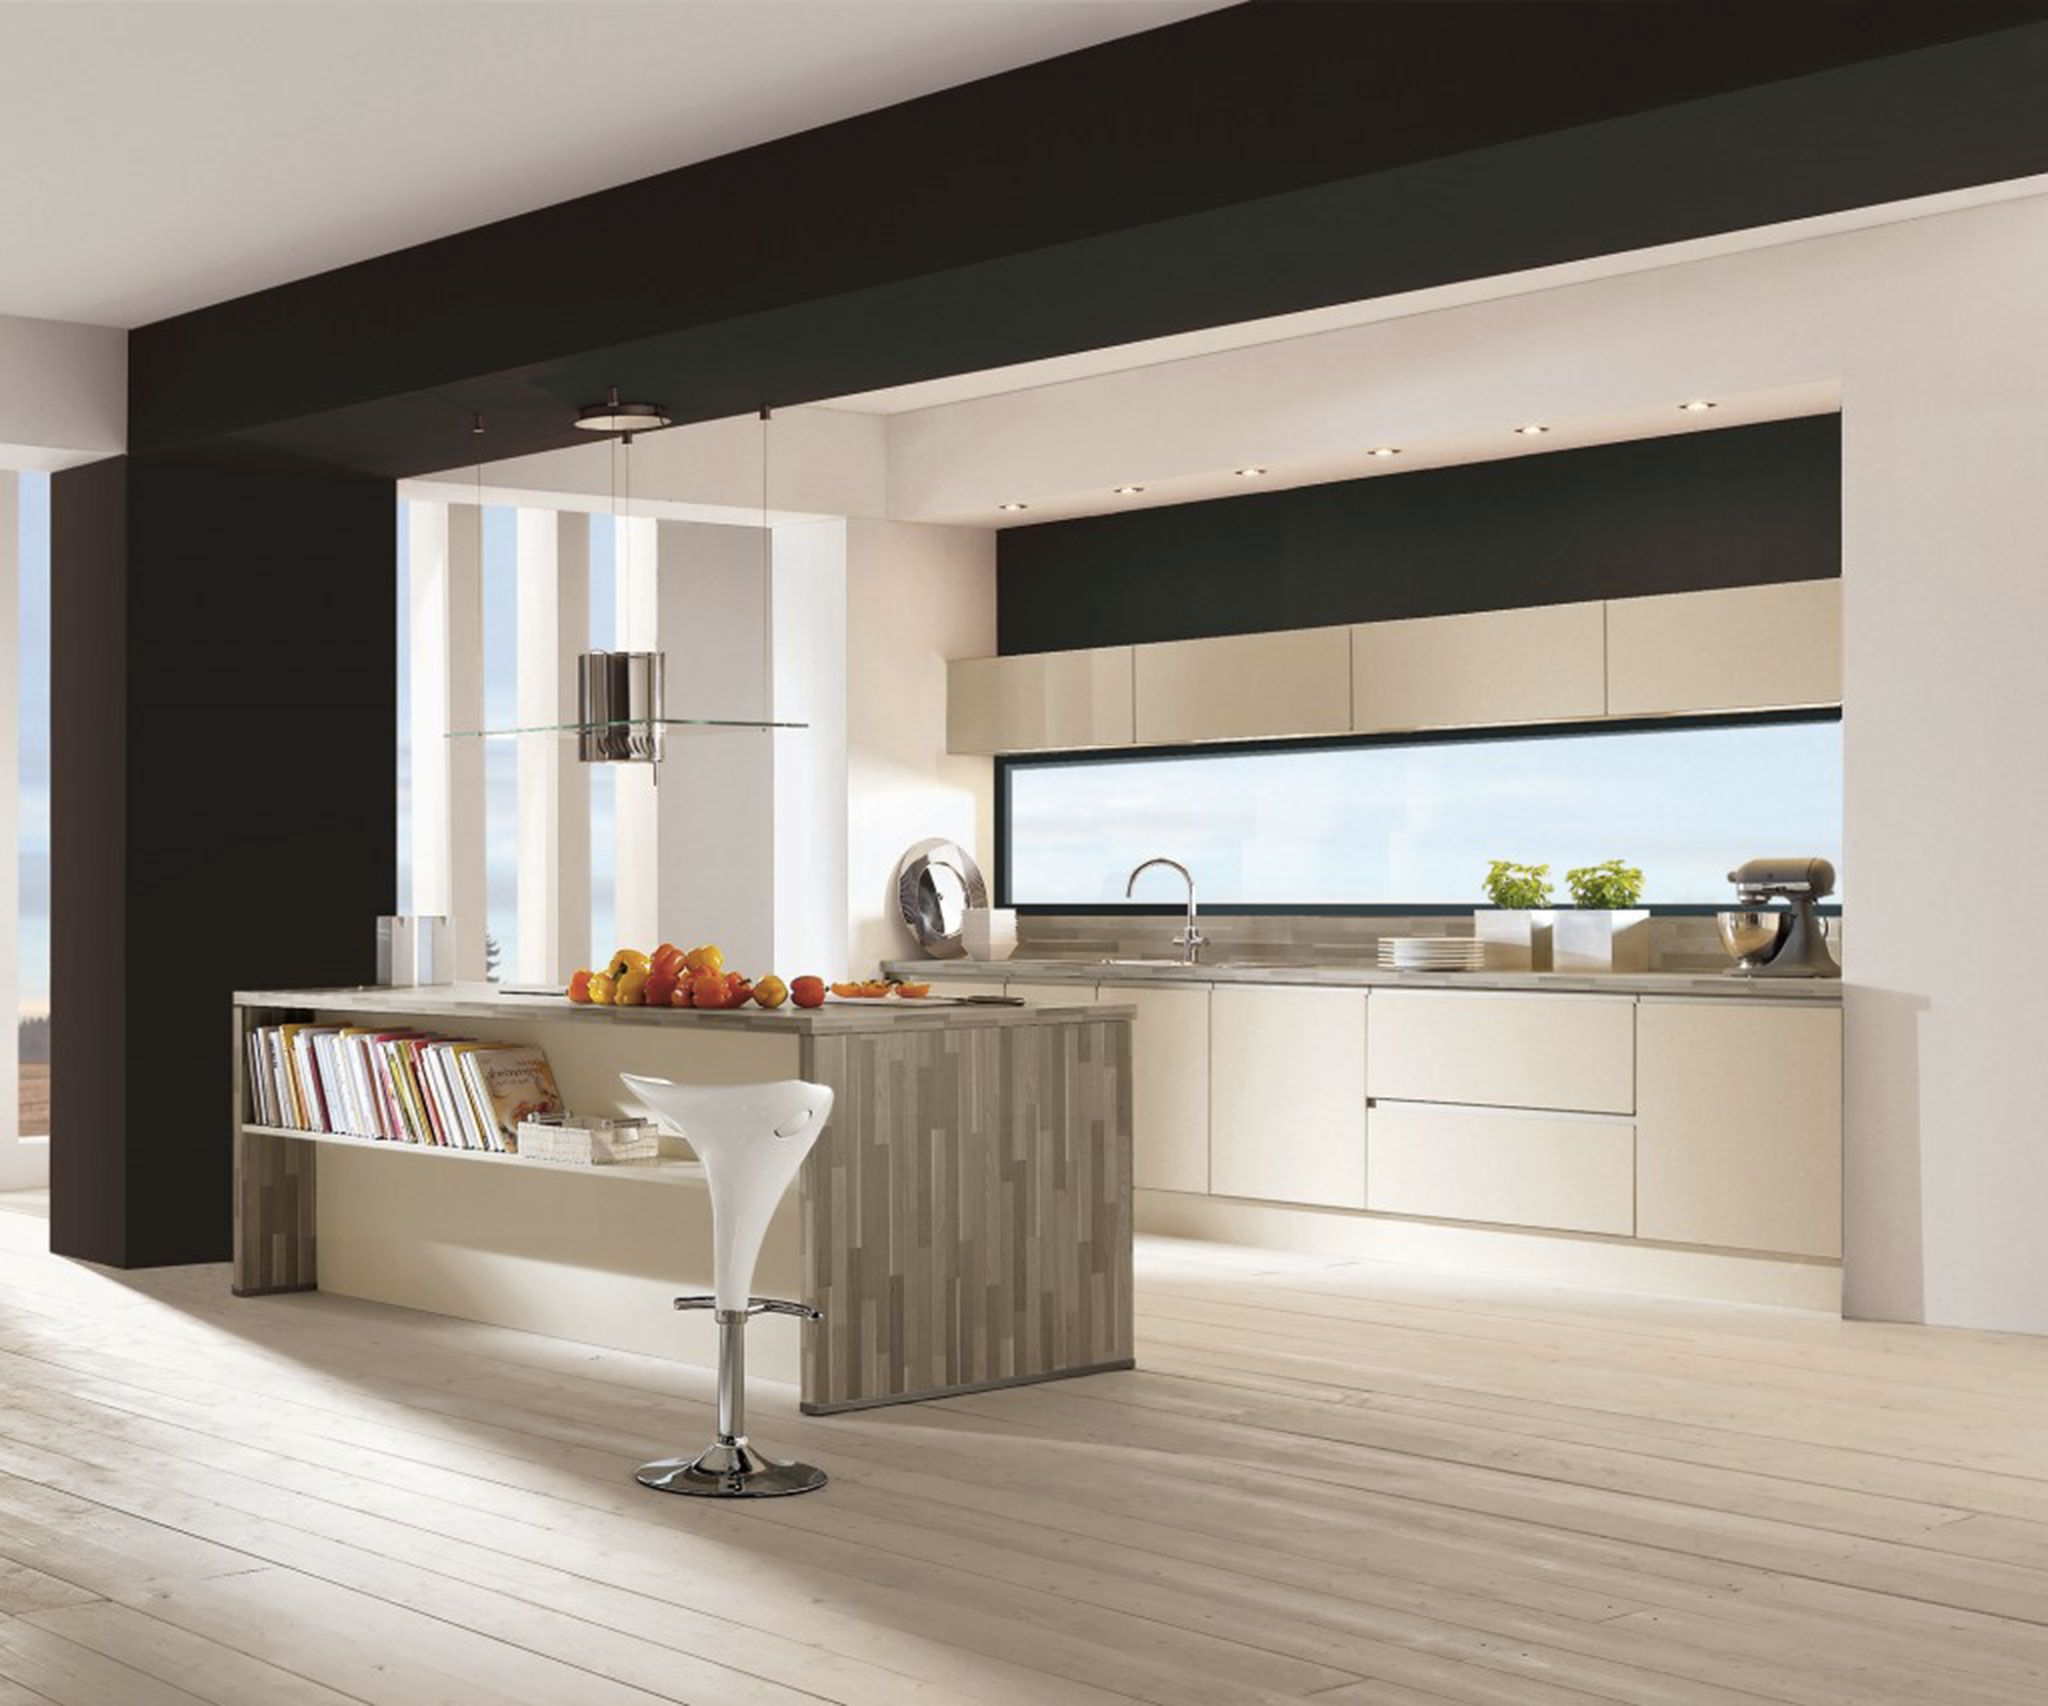 Cuisine beige et blanc pas cher sur cuisine.lareduc.com | Cuisine ...